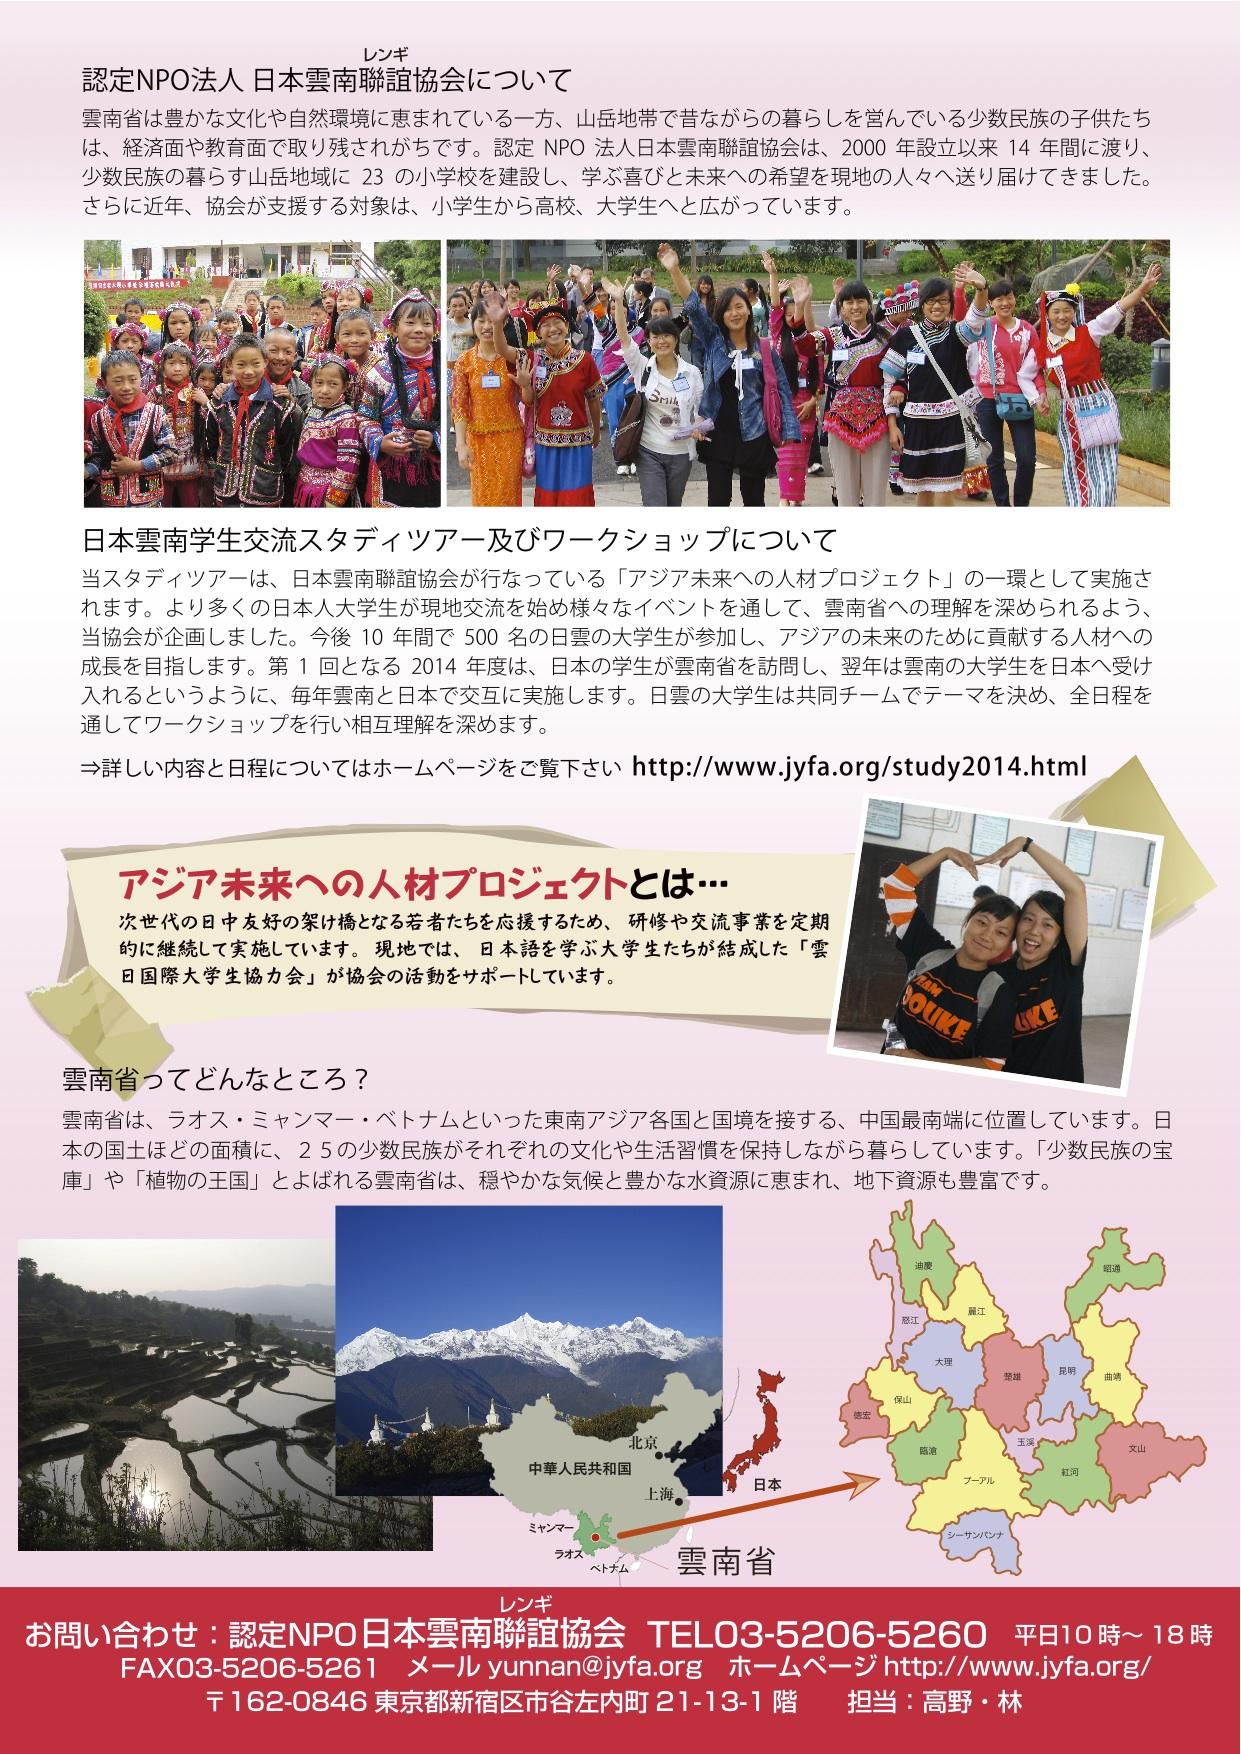 http://www.jyfa.org/2_education/img/studytour/study2014_ura.jpg